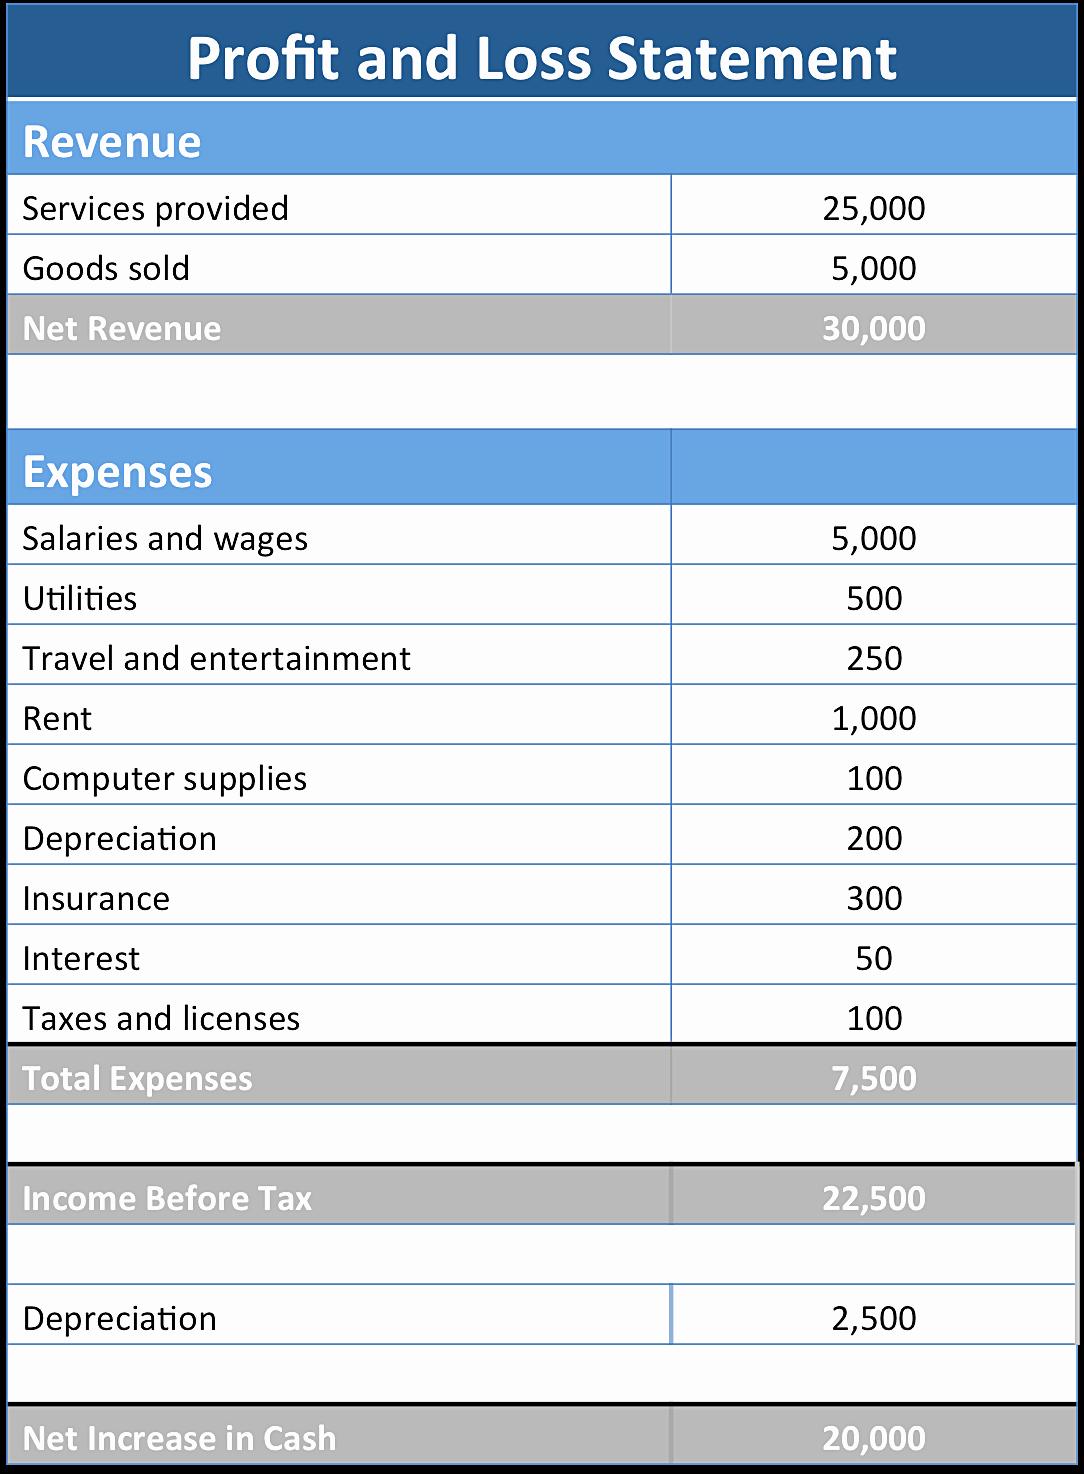 Sample Profit Loss Statement Template Inspirational Basic Profit and Loss Statement Template Mughals